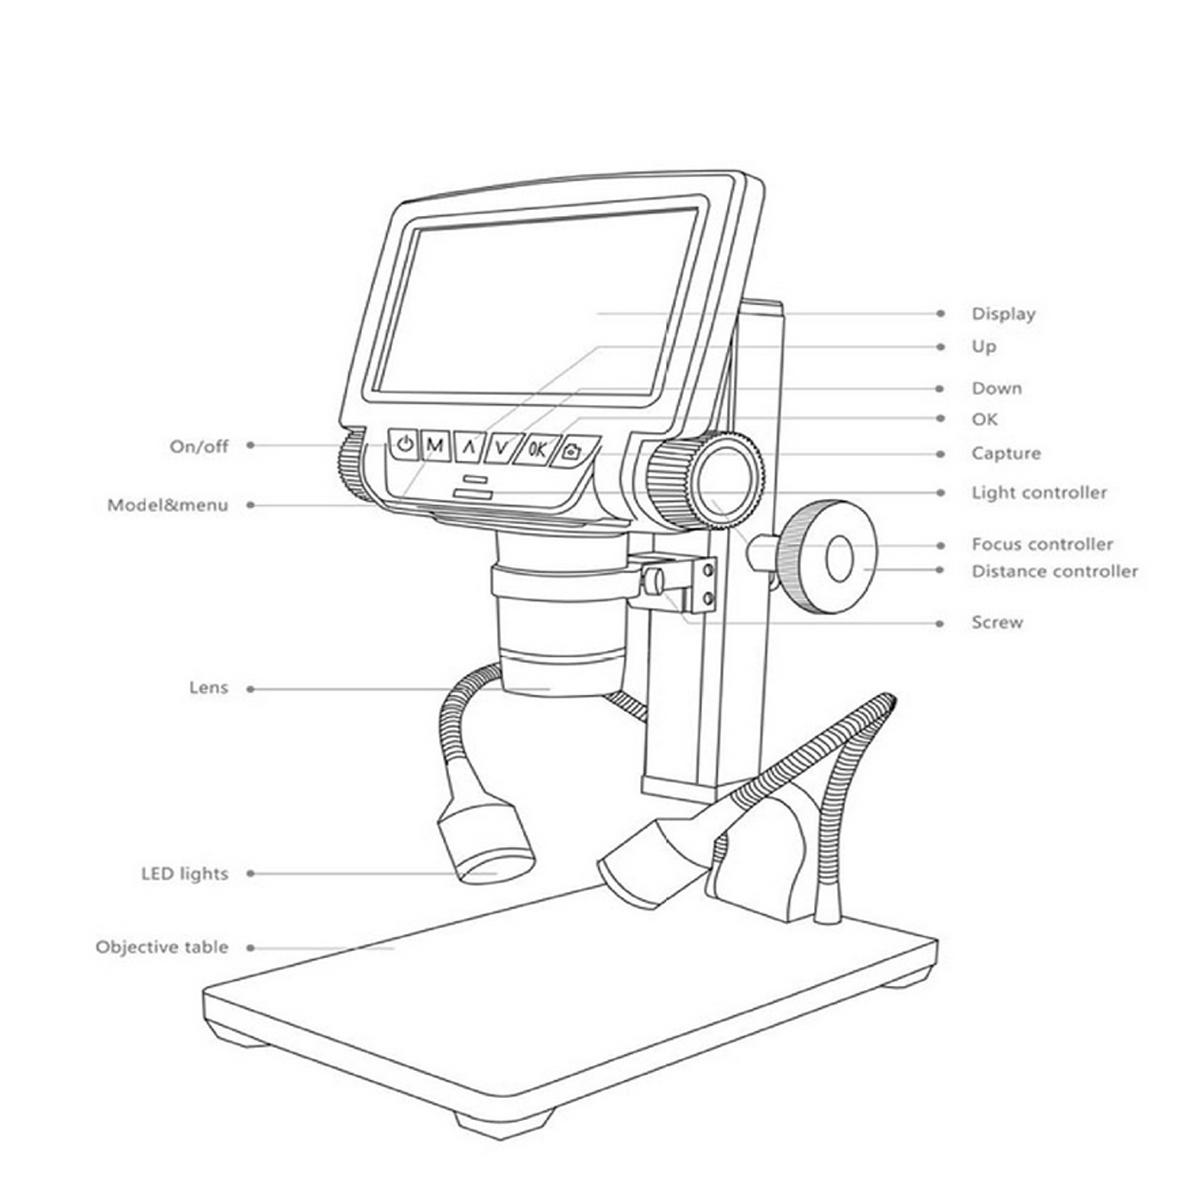 Andonstar Adsm301 260x P Industrial Microscope Digital